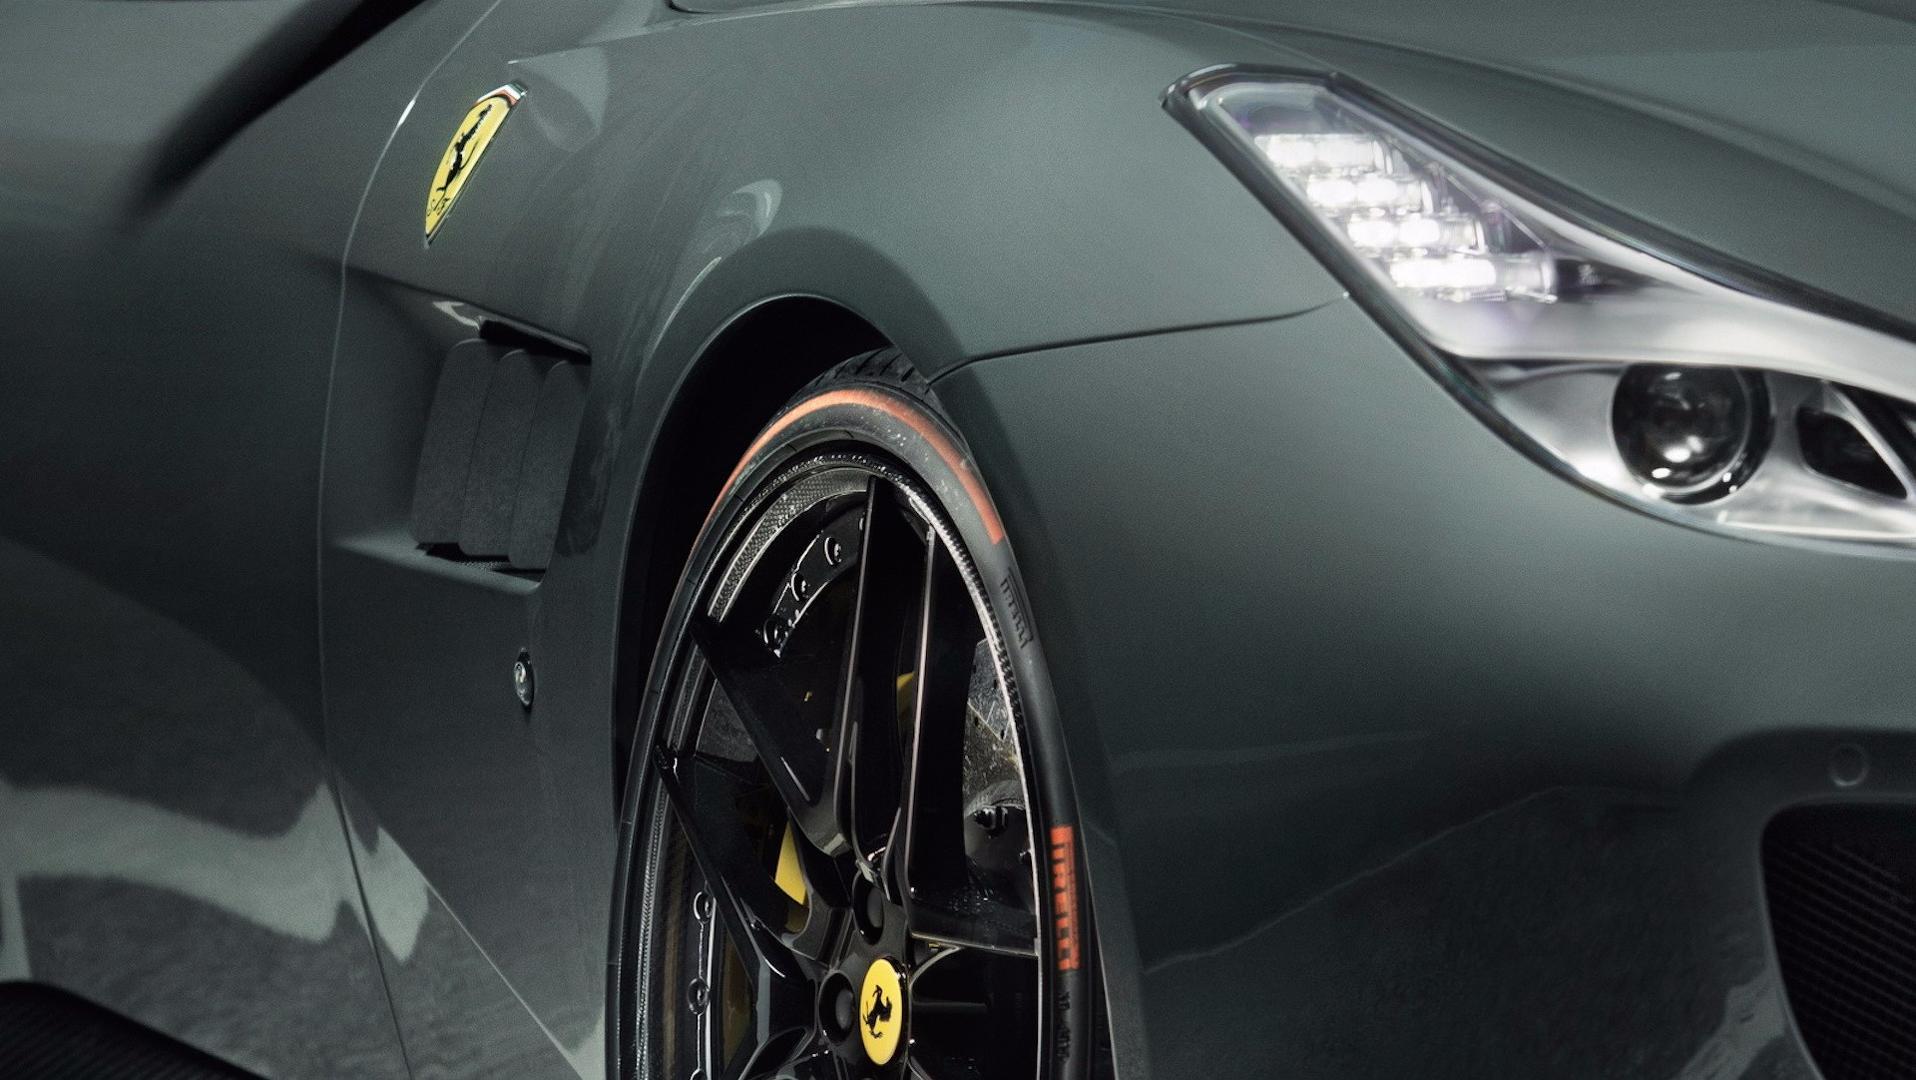 Ferrari GTC4Lusso by Novitec (10)